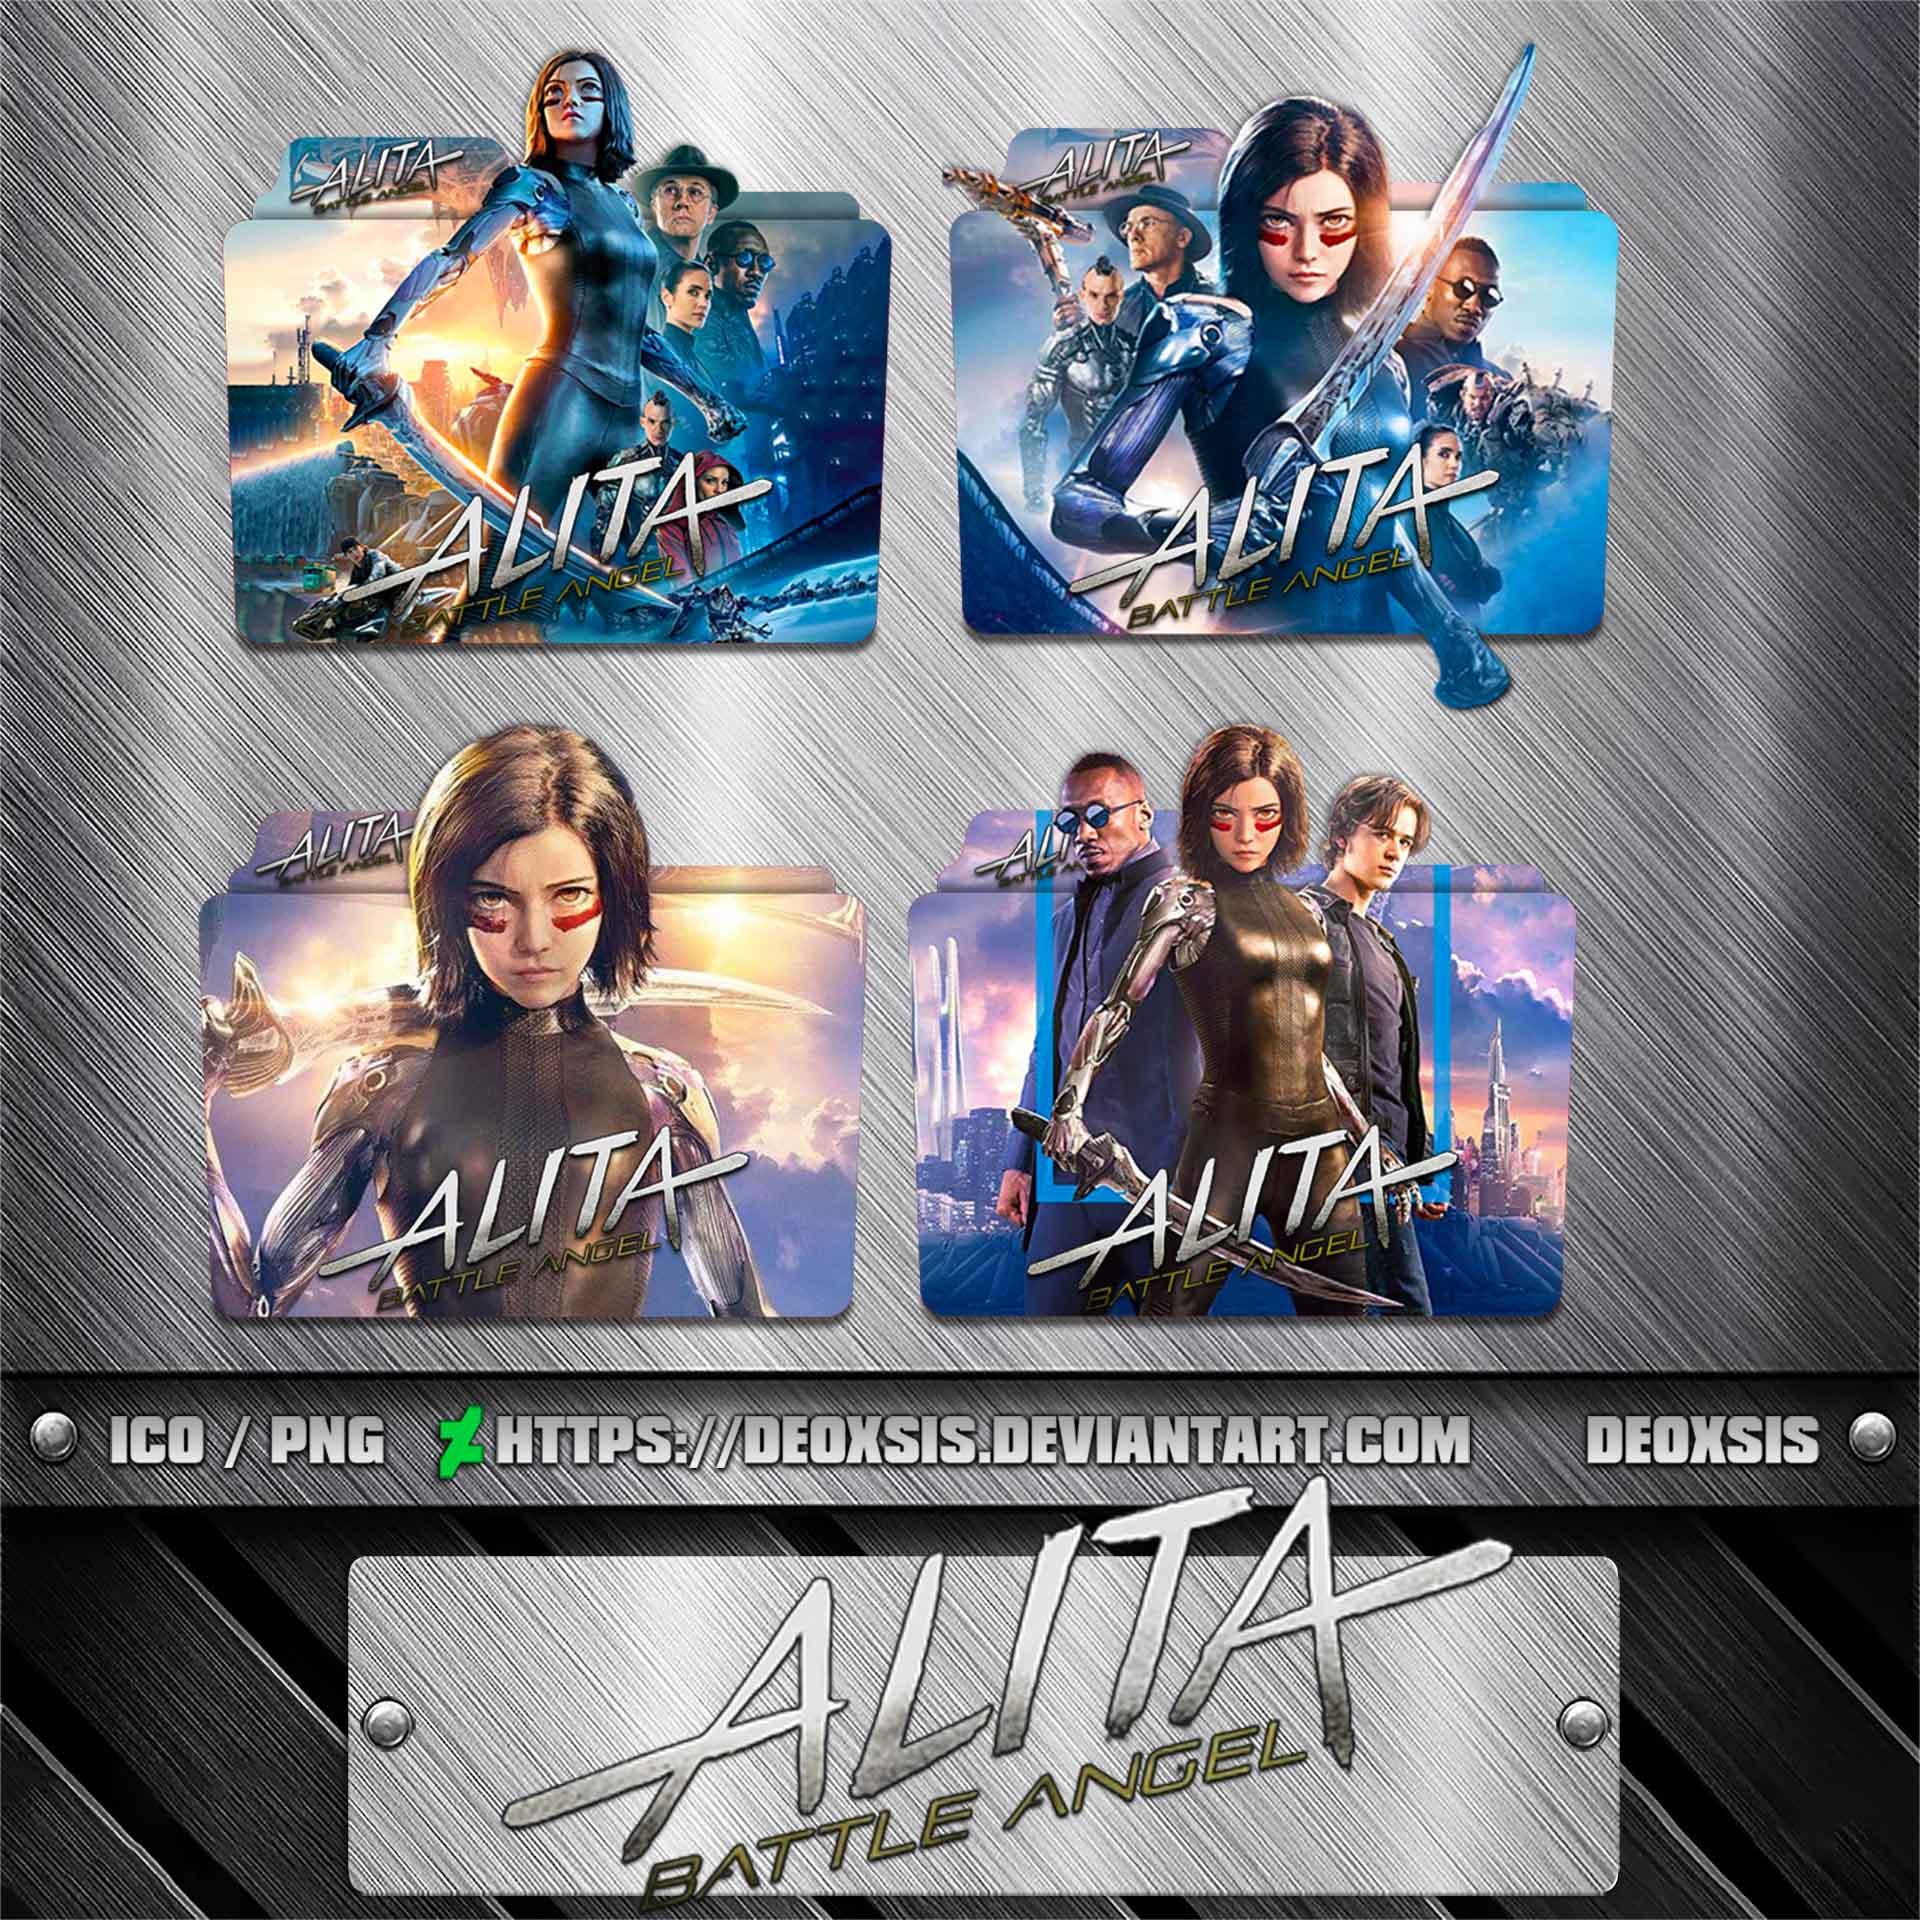 Alita Battle Angel 2019 Folder Icon Pack By Deoxsis On Deviantart